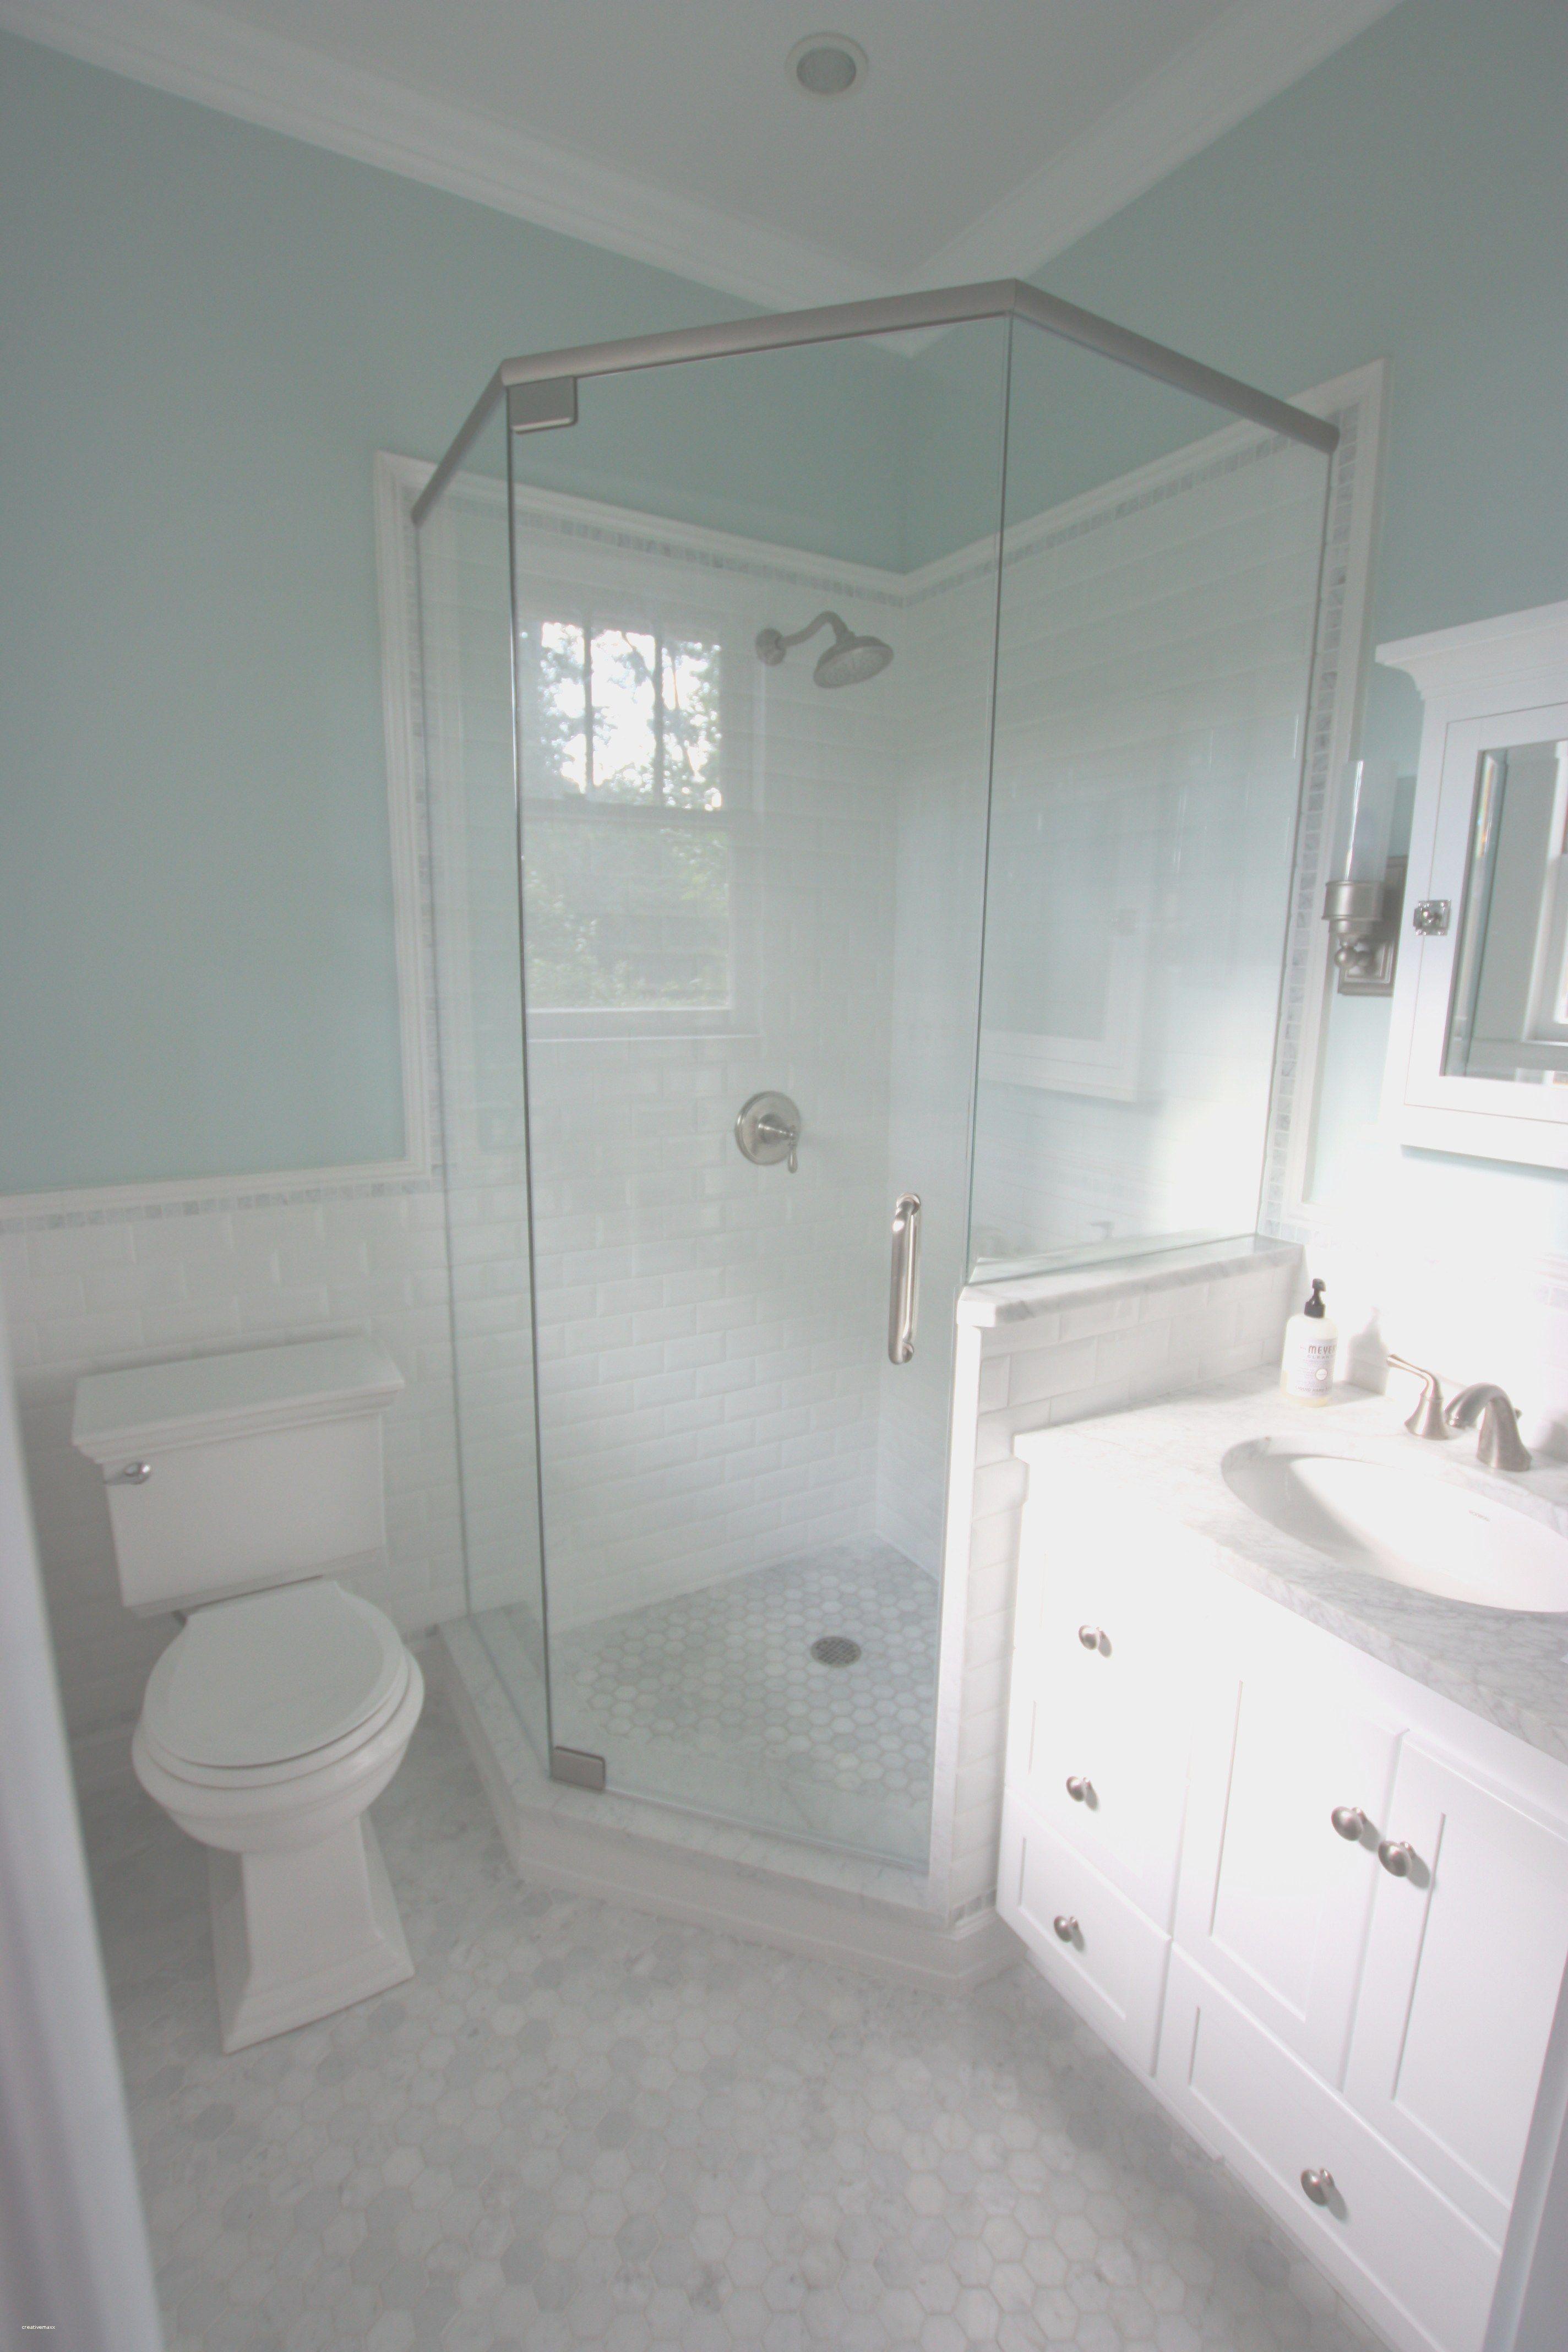 Bathroom Tile Flooring Home Depot Case Small Bathroom Decorations